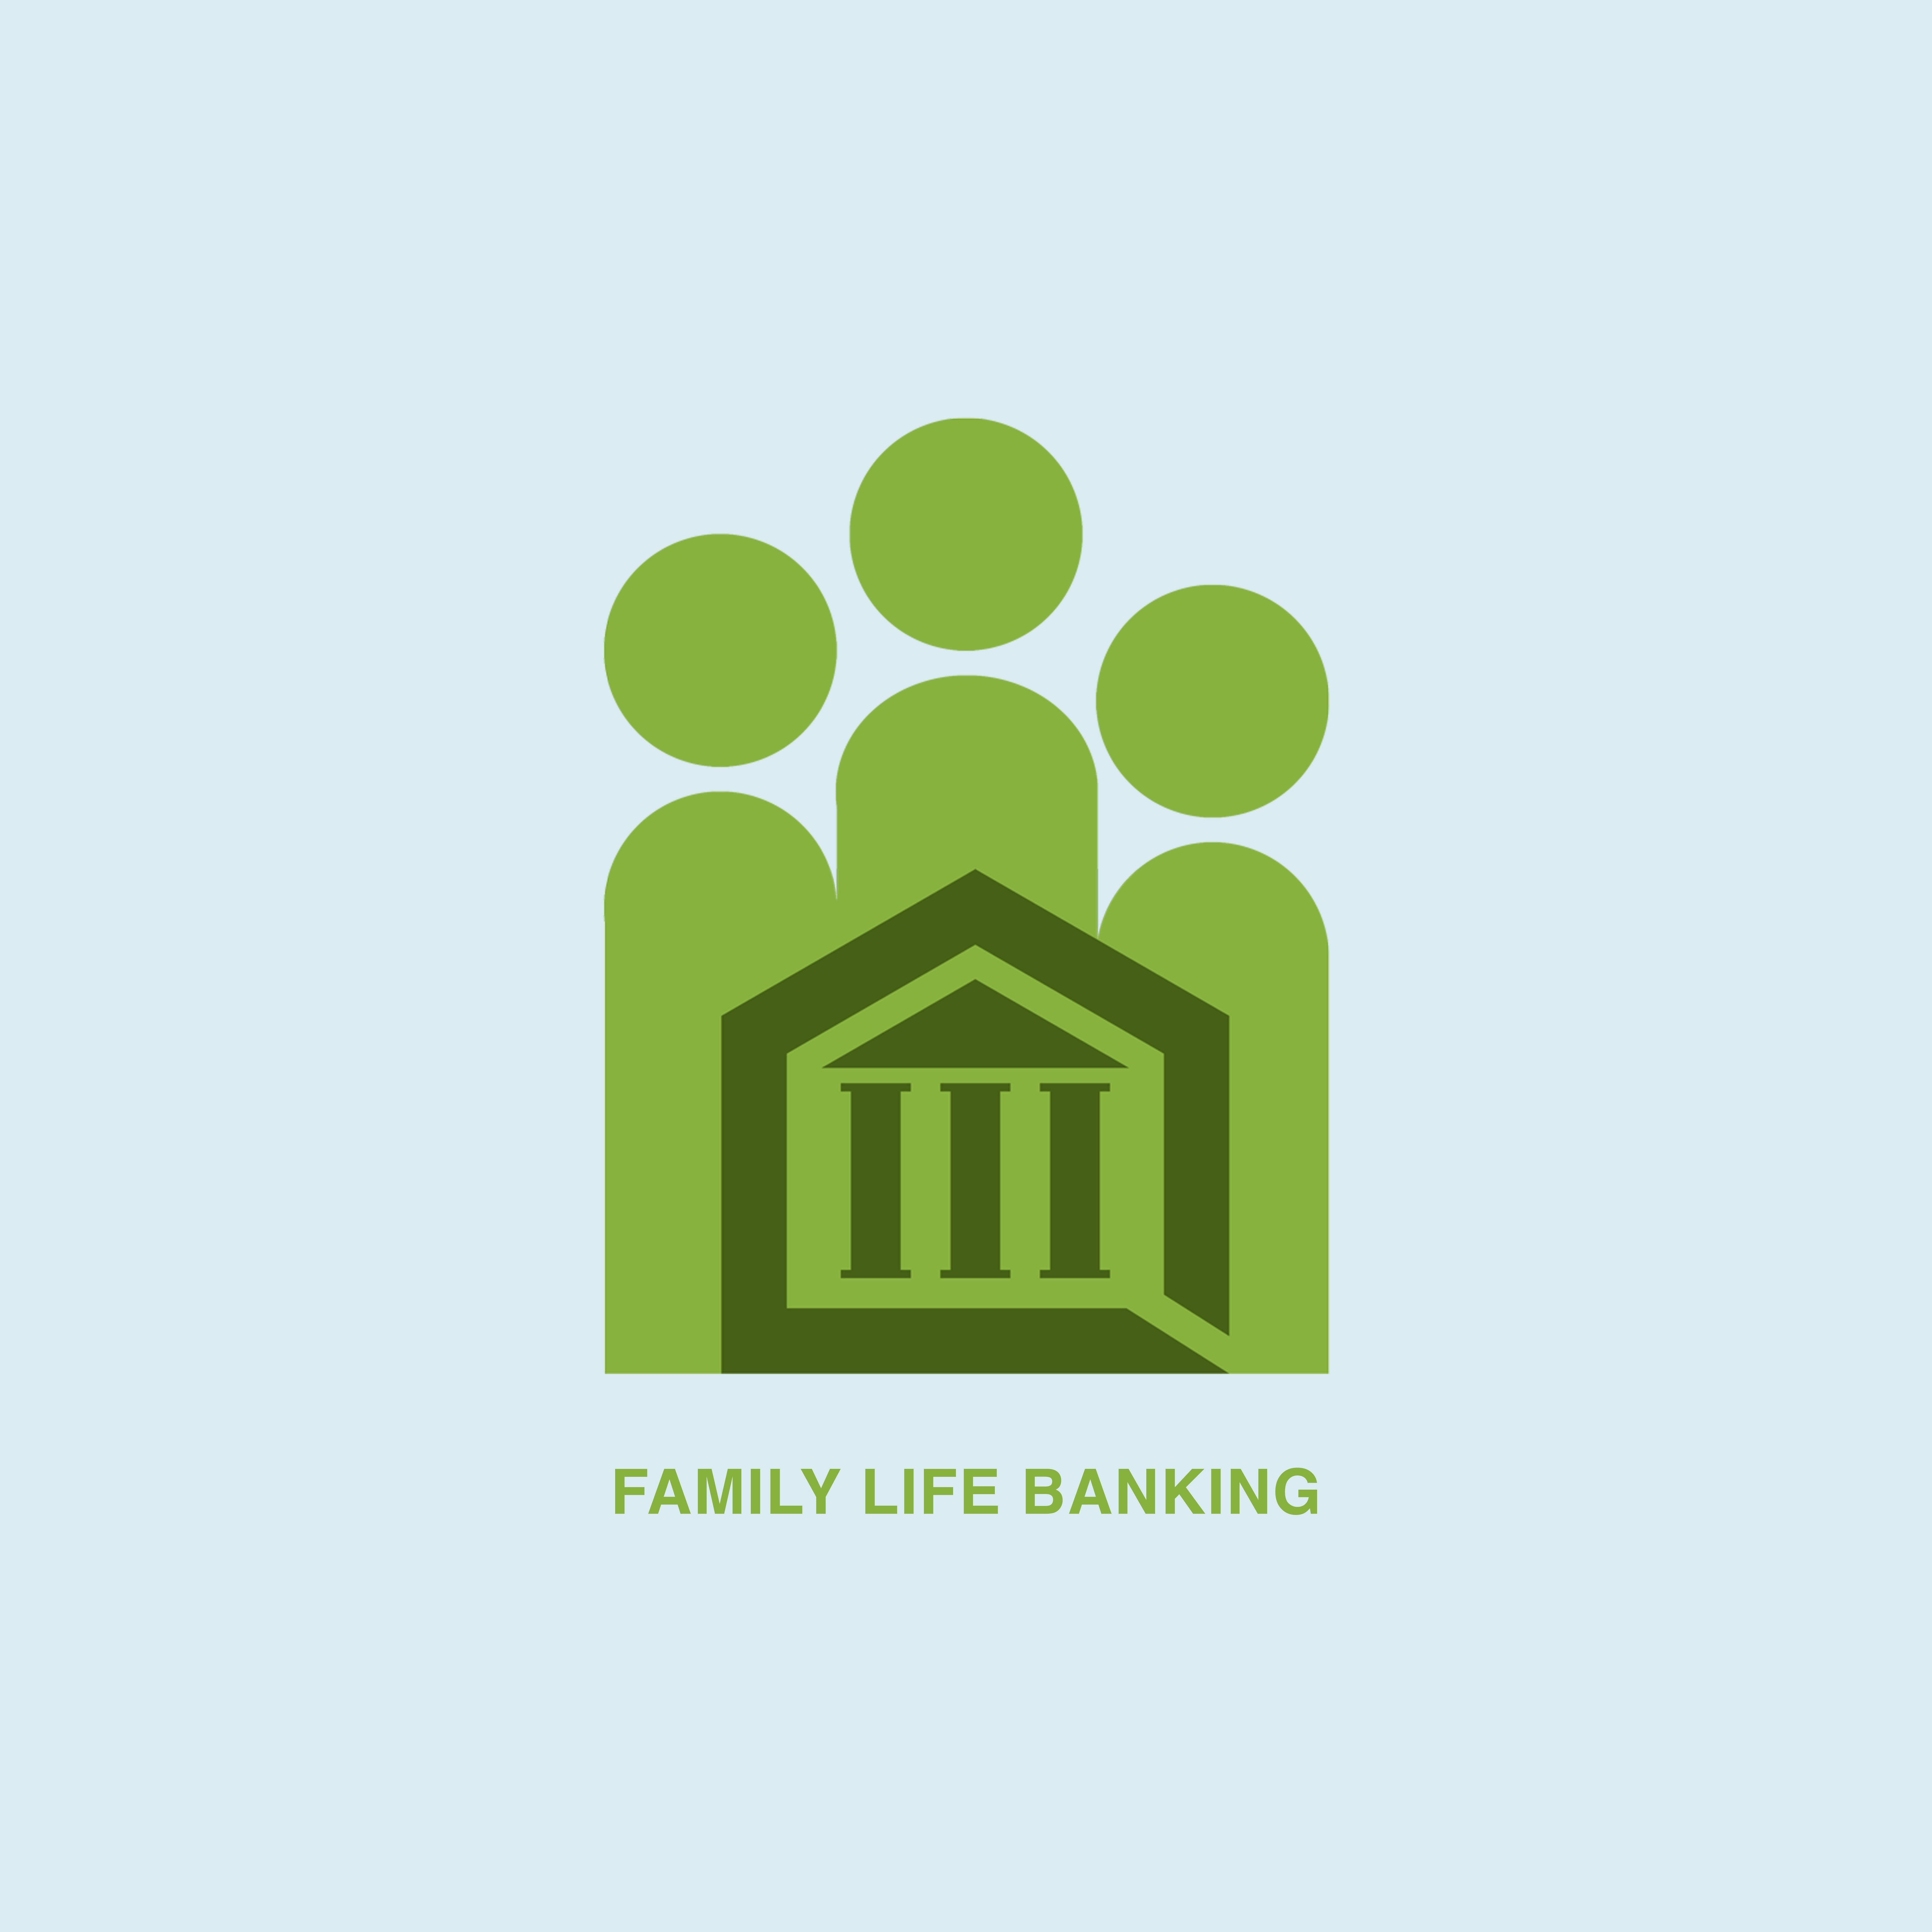 Family Life Banking Logo Design - PIC2MOTION